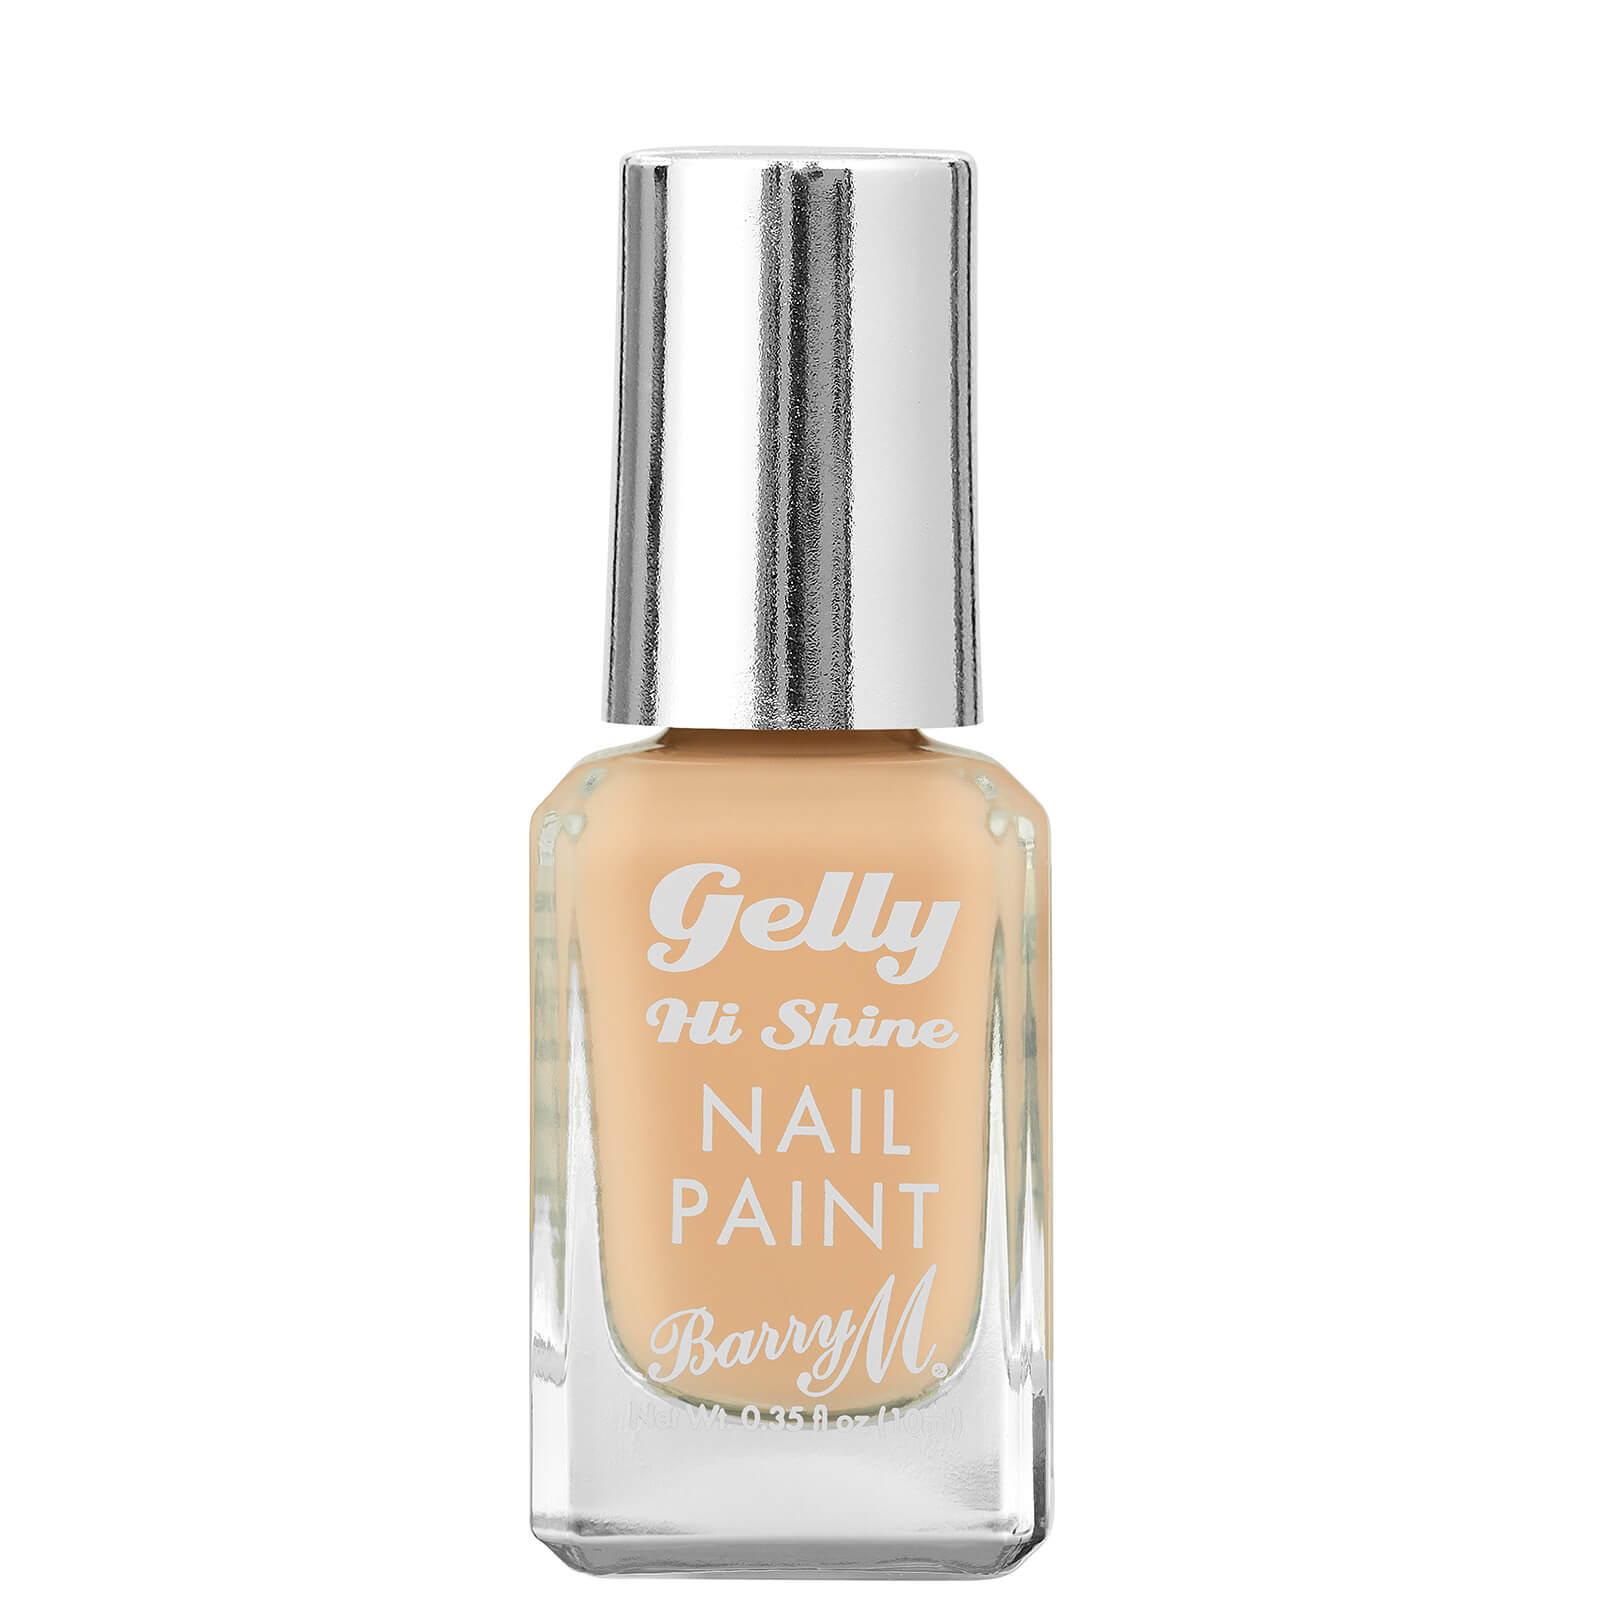 Купить Barry M Cosmetics Gelly Nail Paint 10ml (Various Shades) - Vanilla Slice